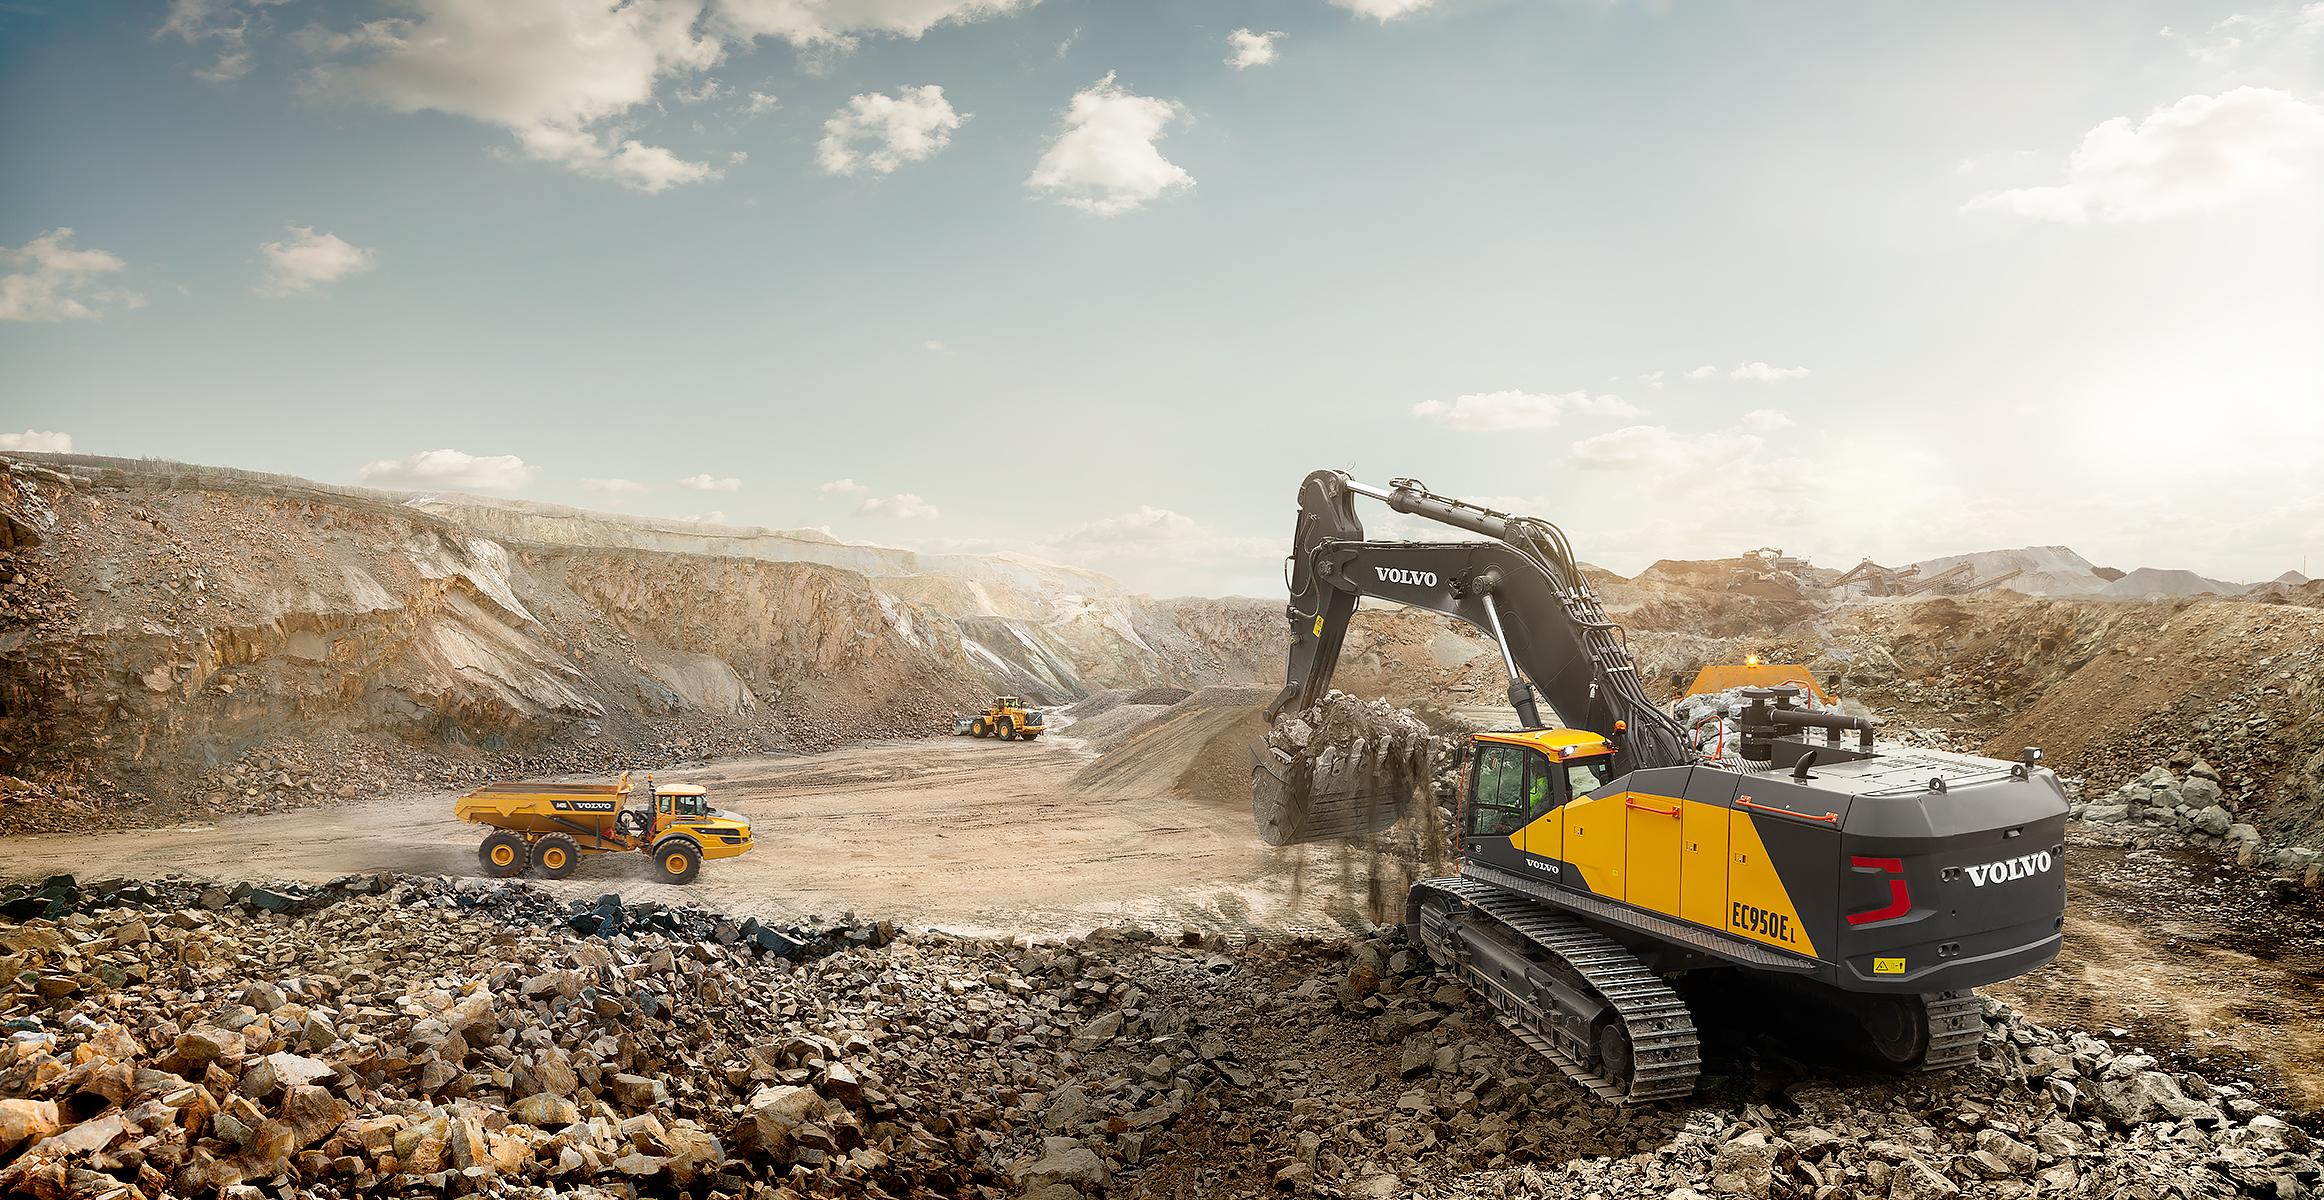 EC950E | Excavators | Overview | Volvo Construction Equipment